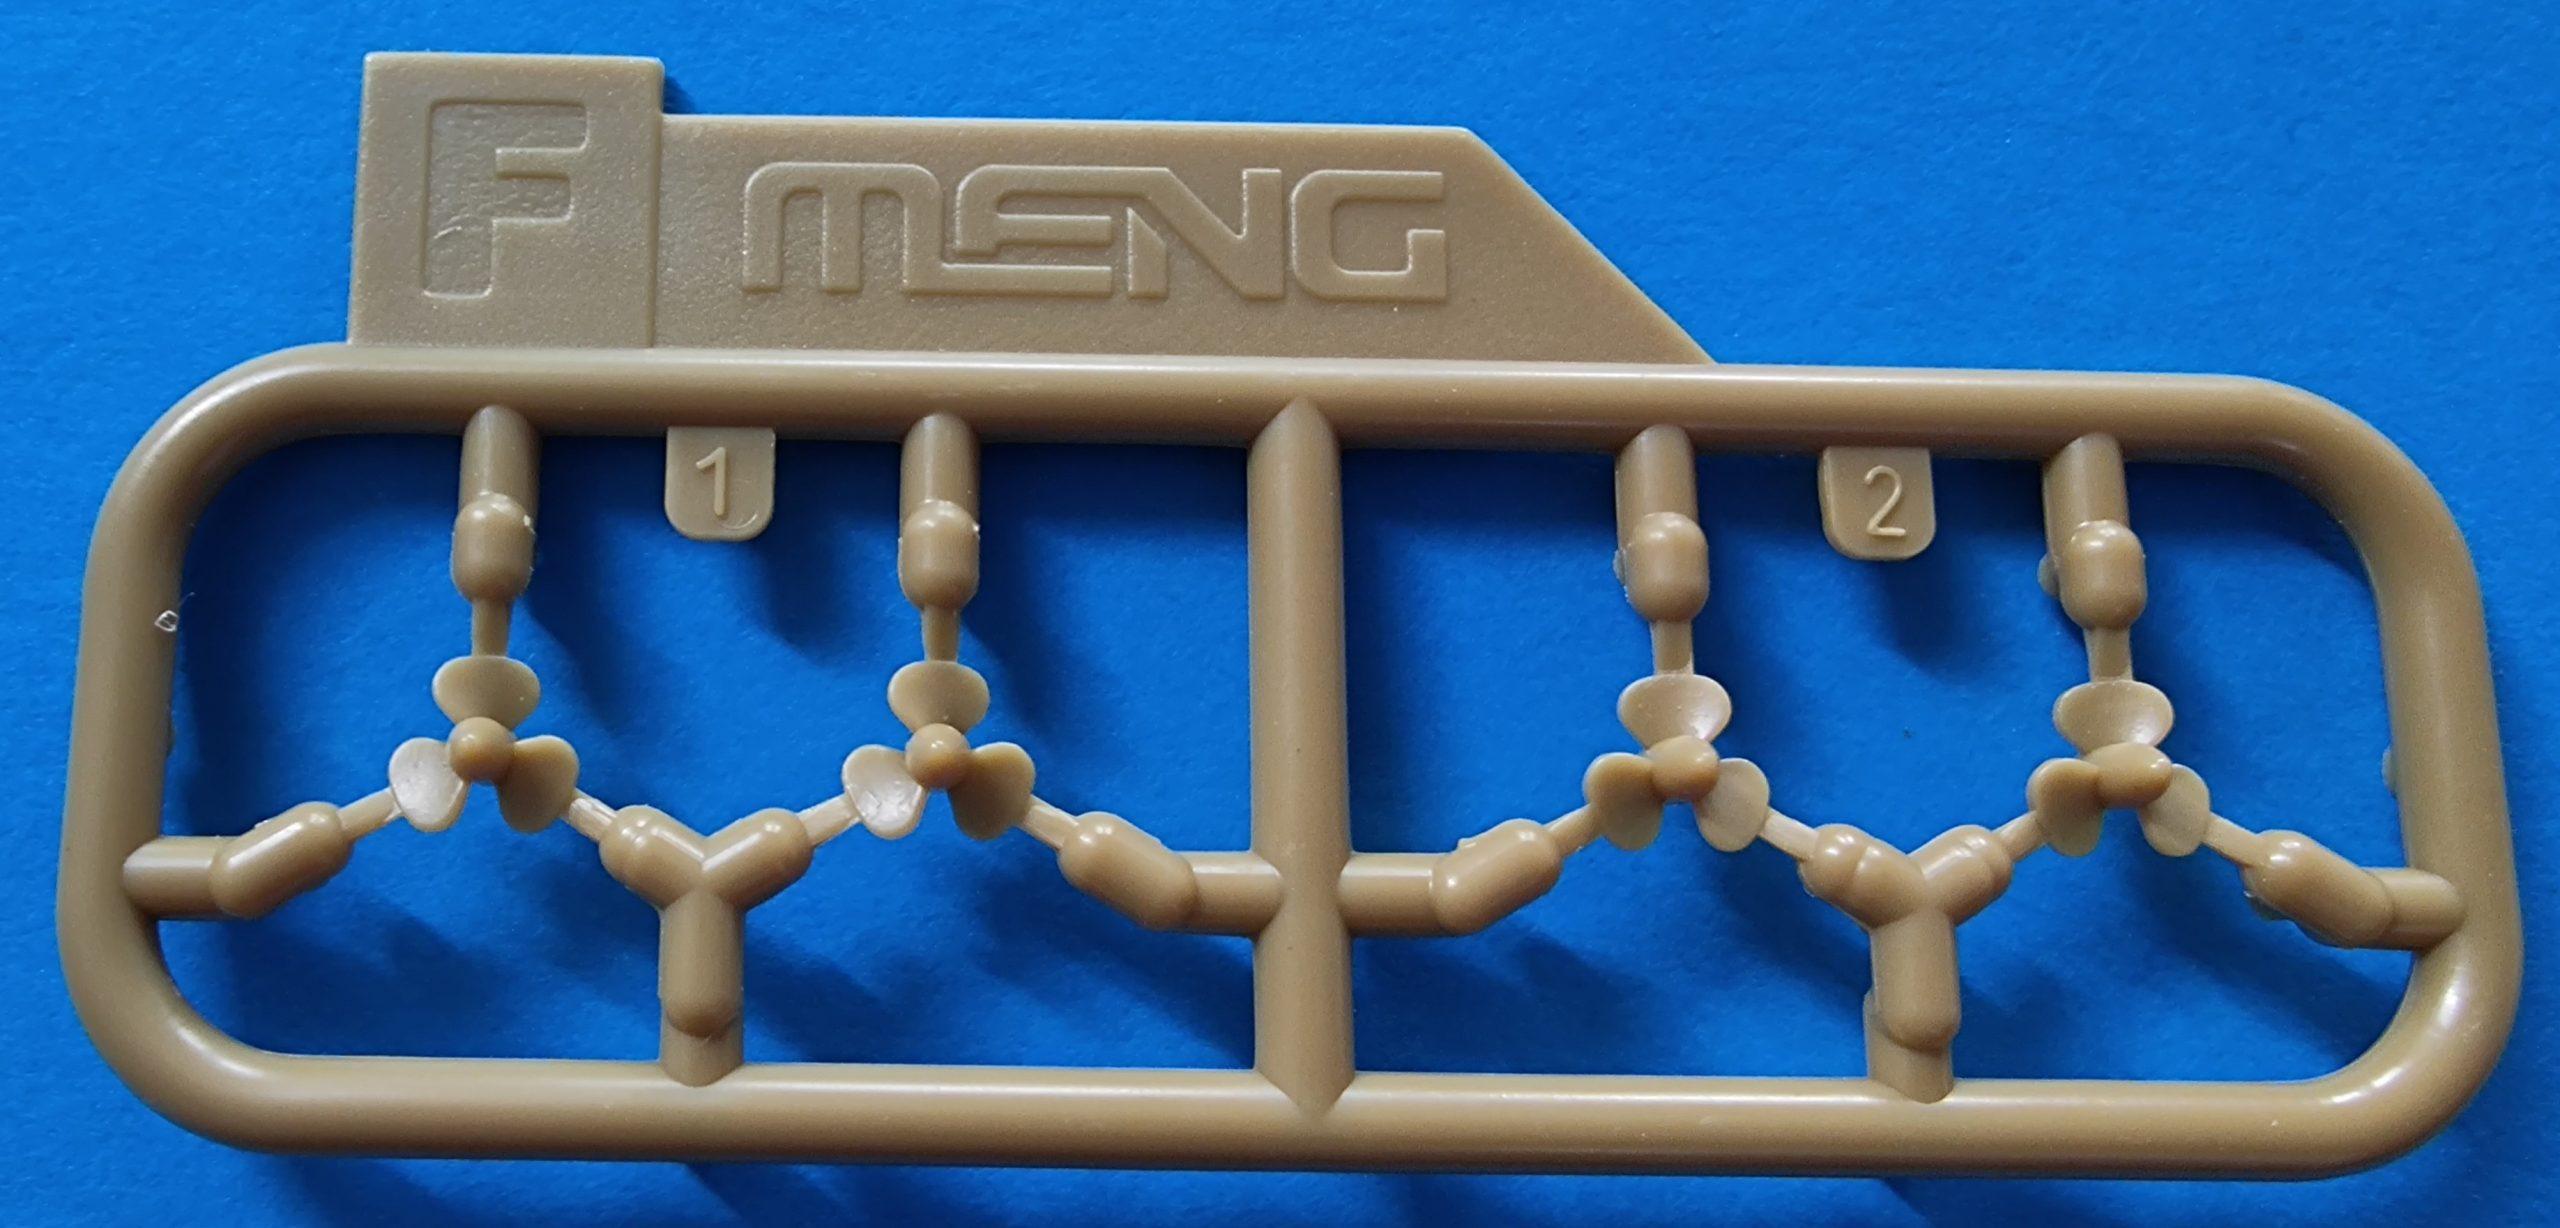 meng_enterprise020-scaled U.S. Navy aircraft carrier Enterprise (CV-6) in 1:700 von Meng